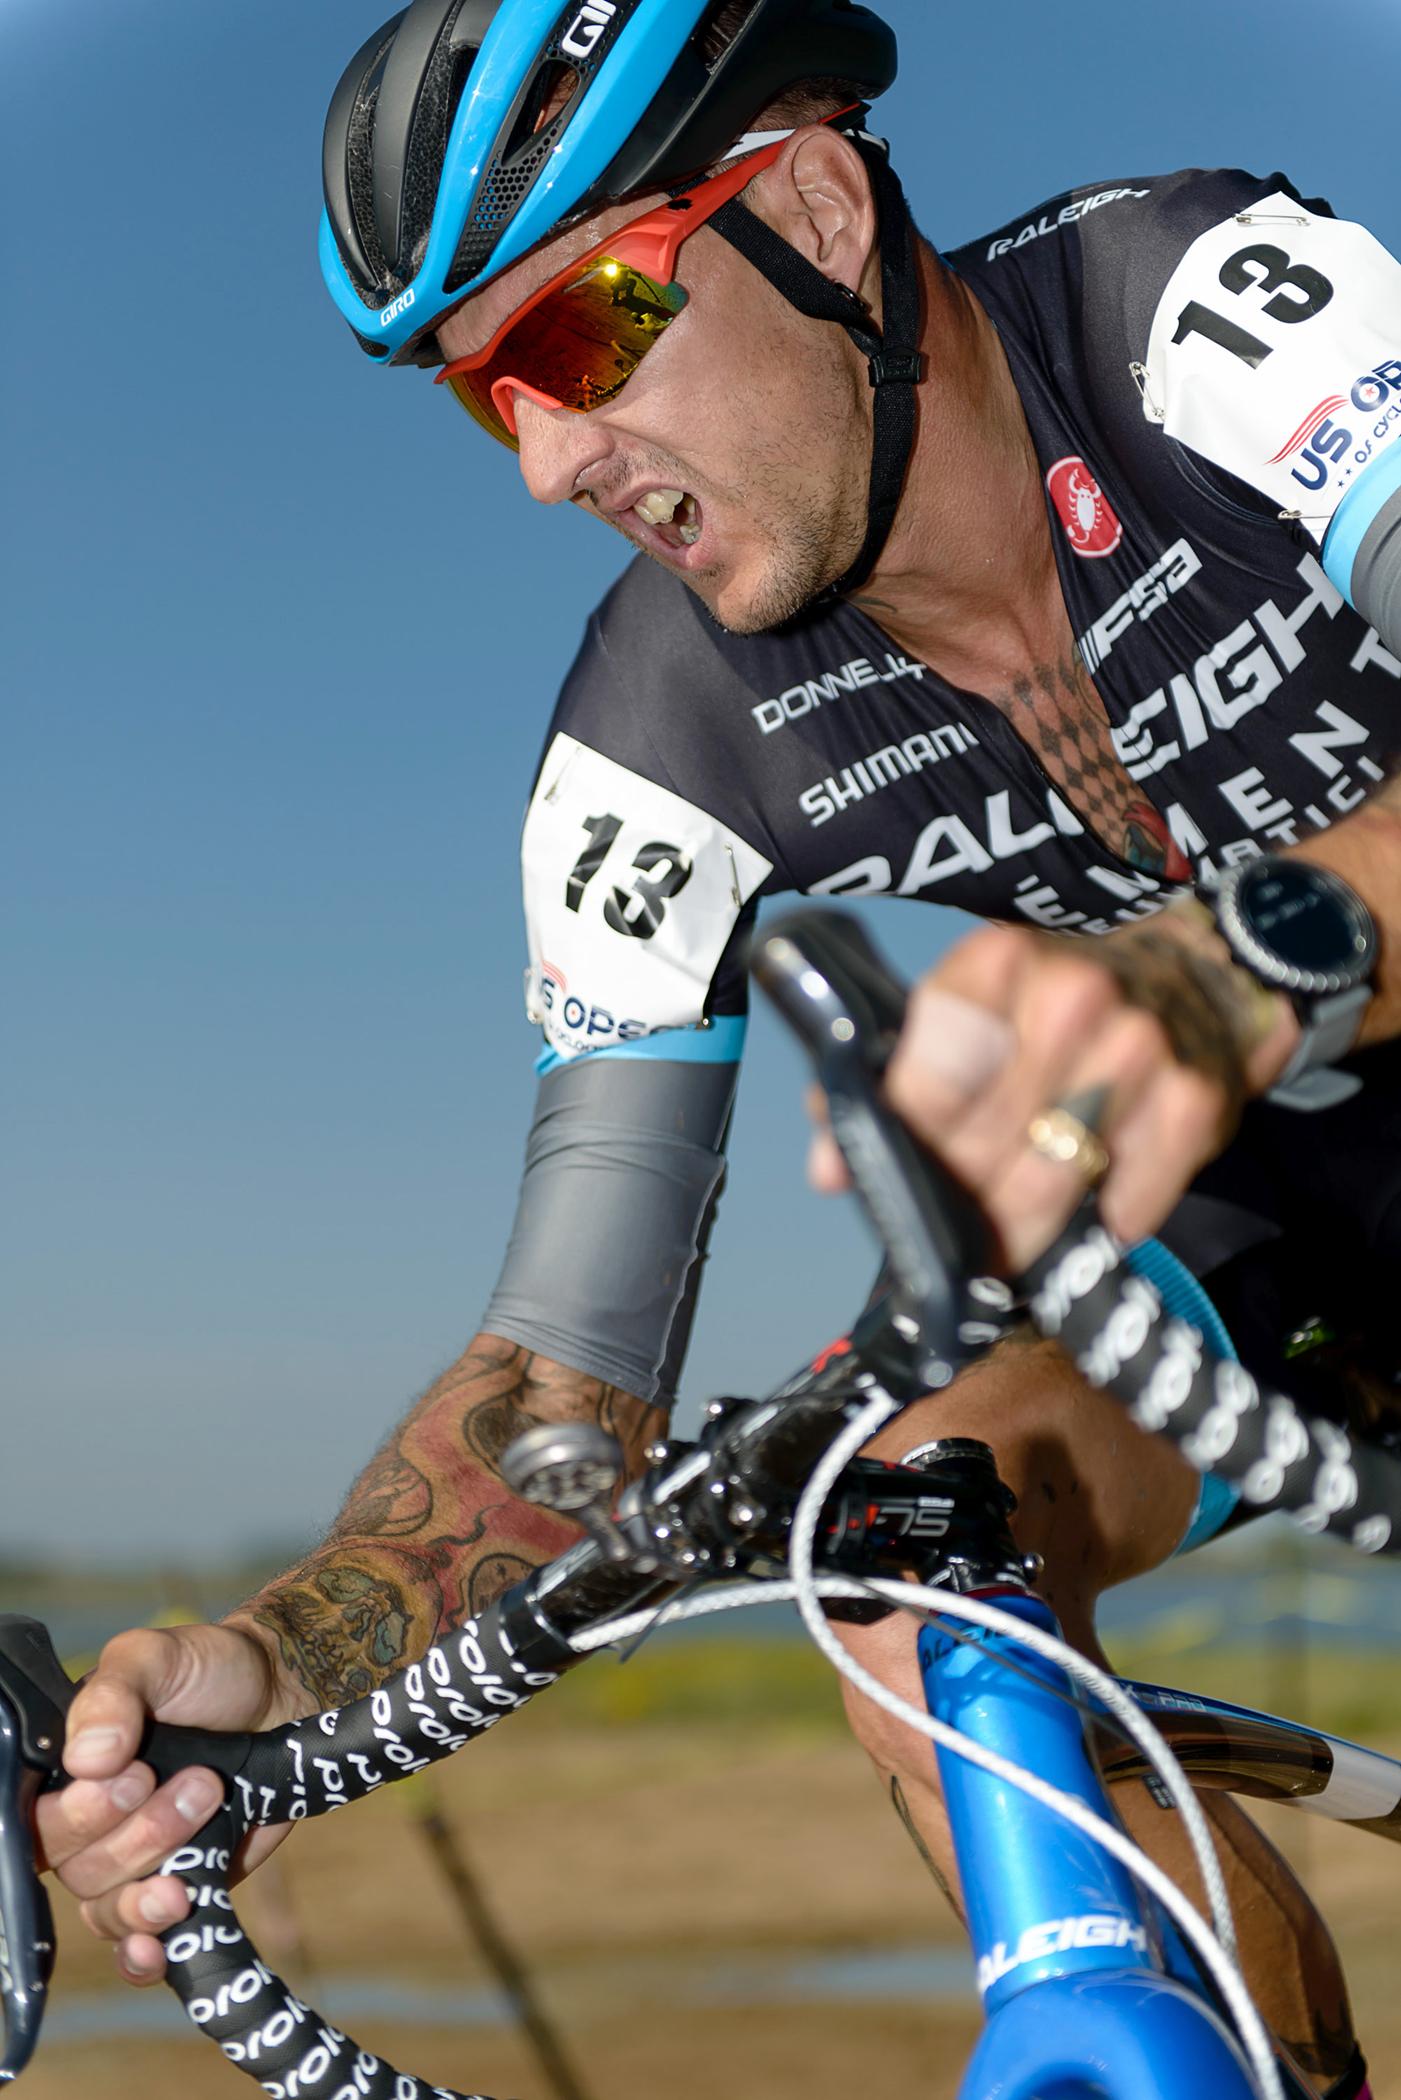 Ben Berden cornering hard at the US Open of Cyclocross. Boulder Reservoir. Boulder, CO.